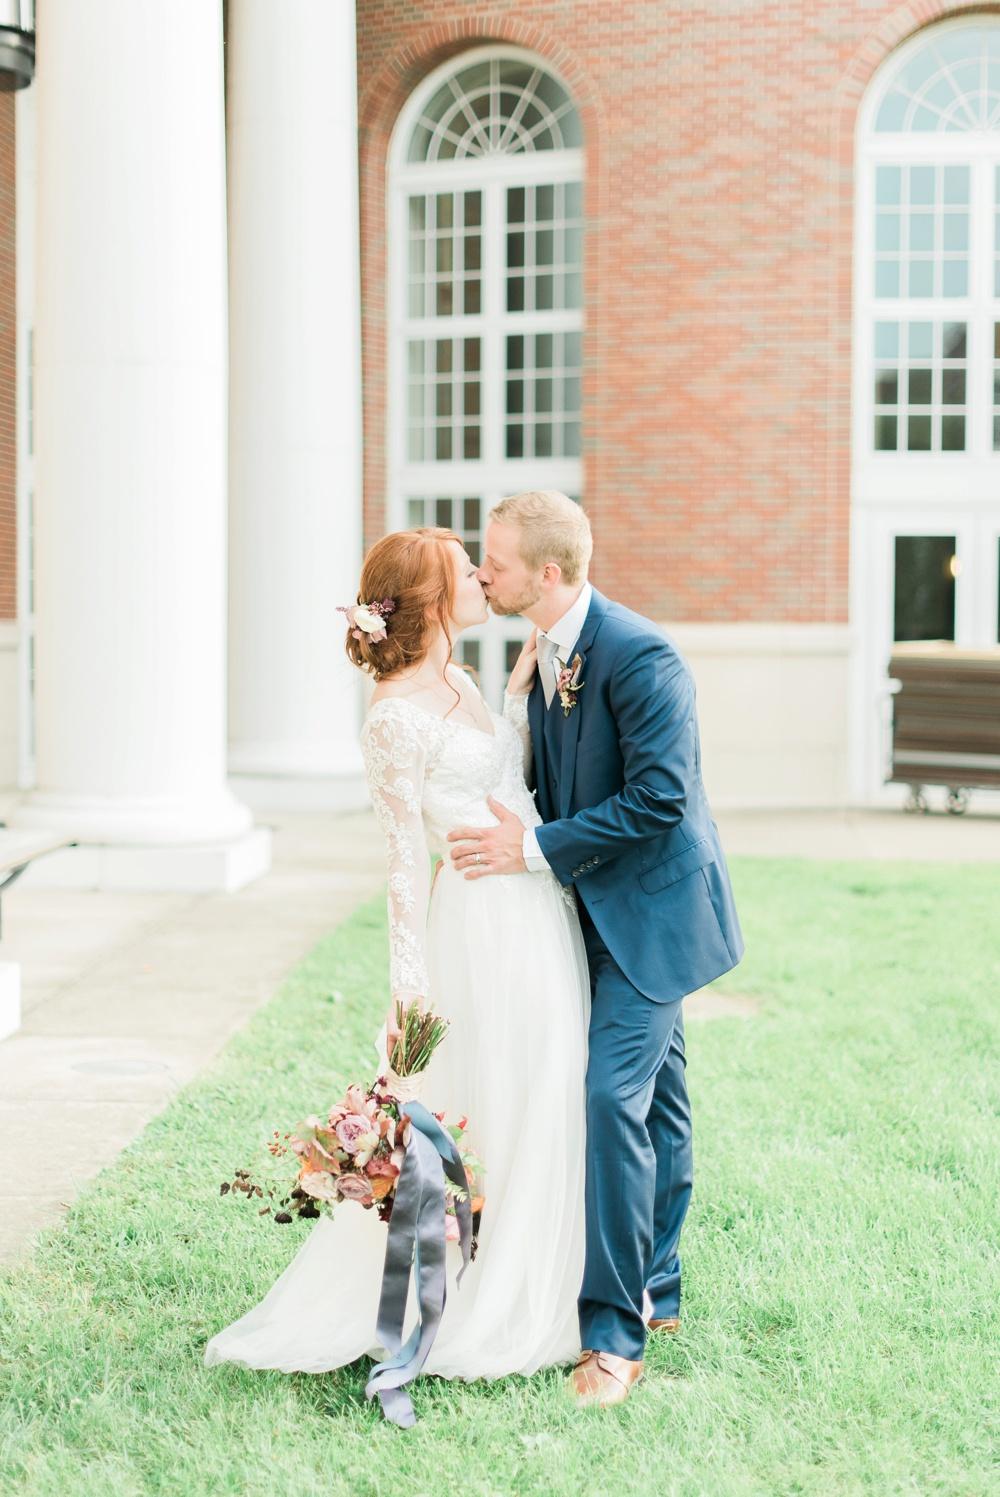 ohio-university-walter-hall-wedding-athens-anna-mark_0143.jpg